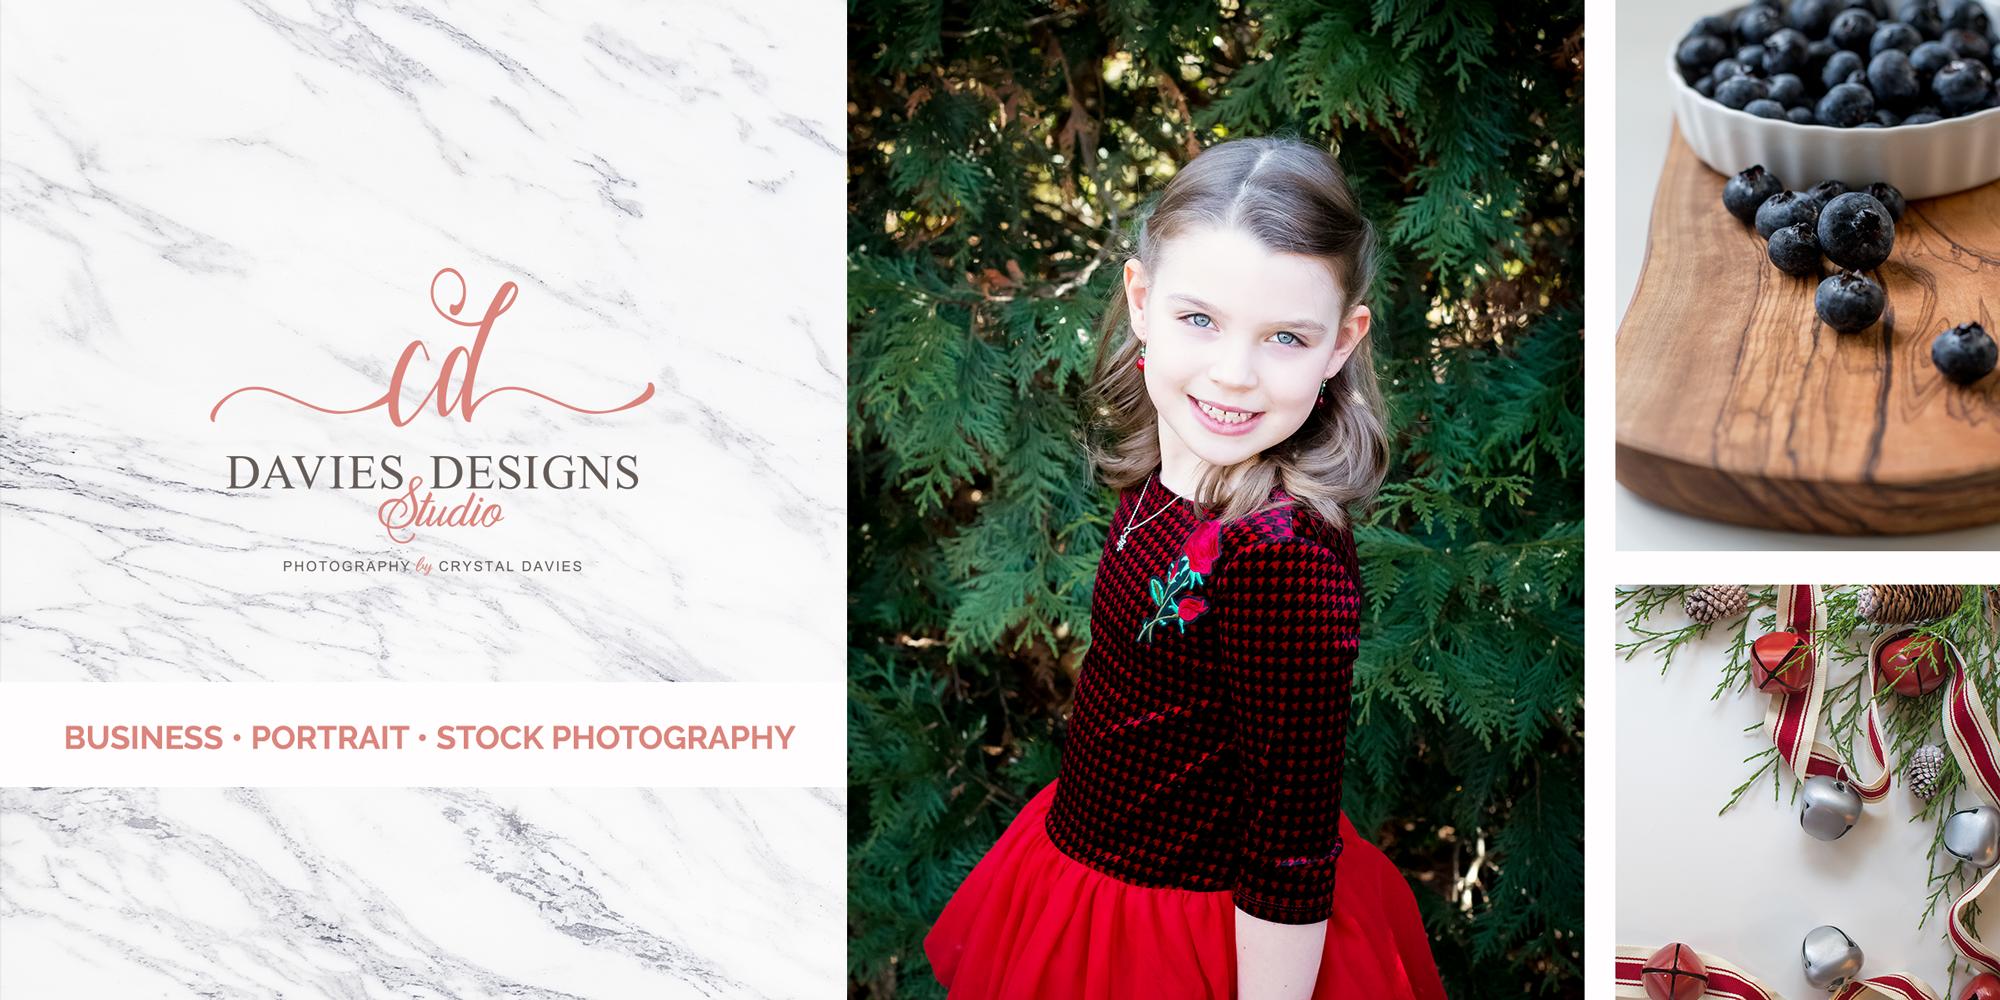 Davies Designs Photography Studio